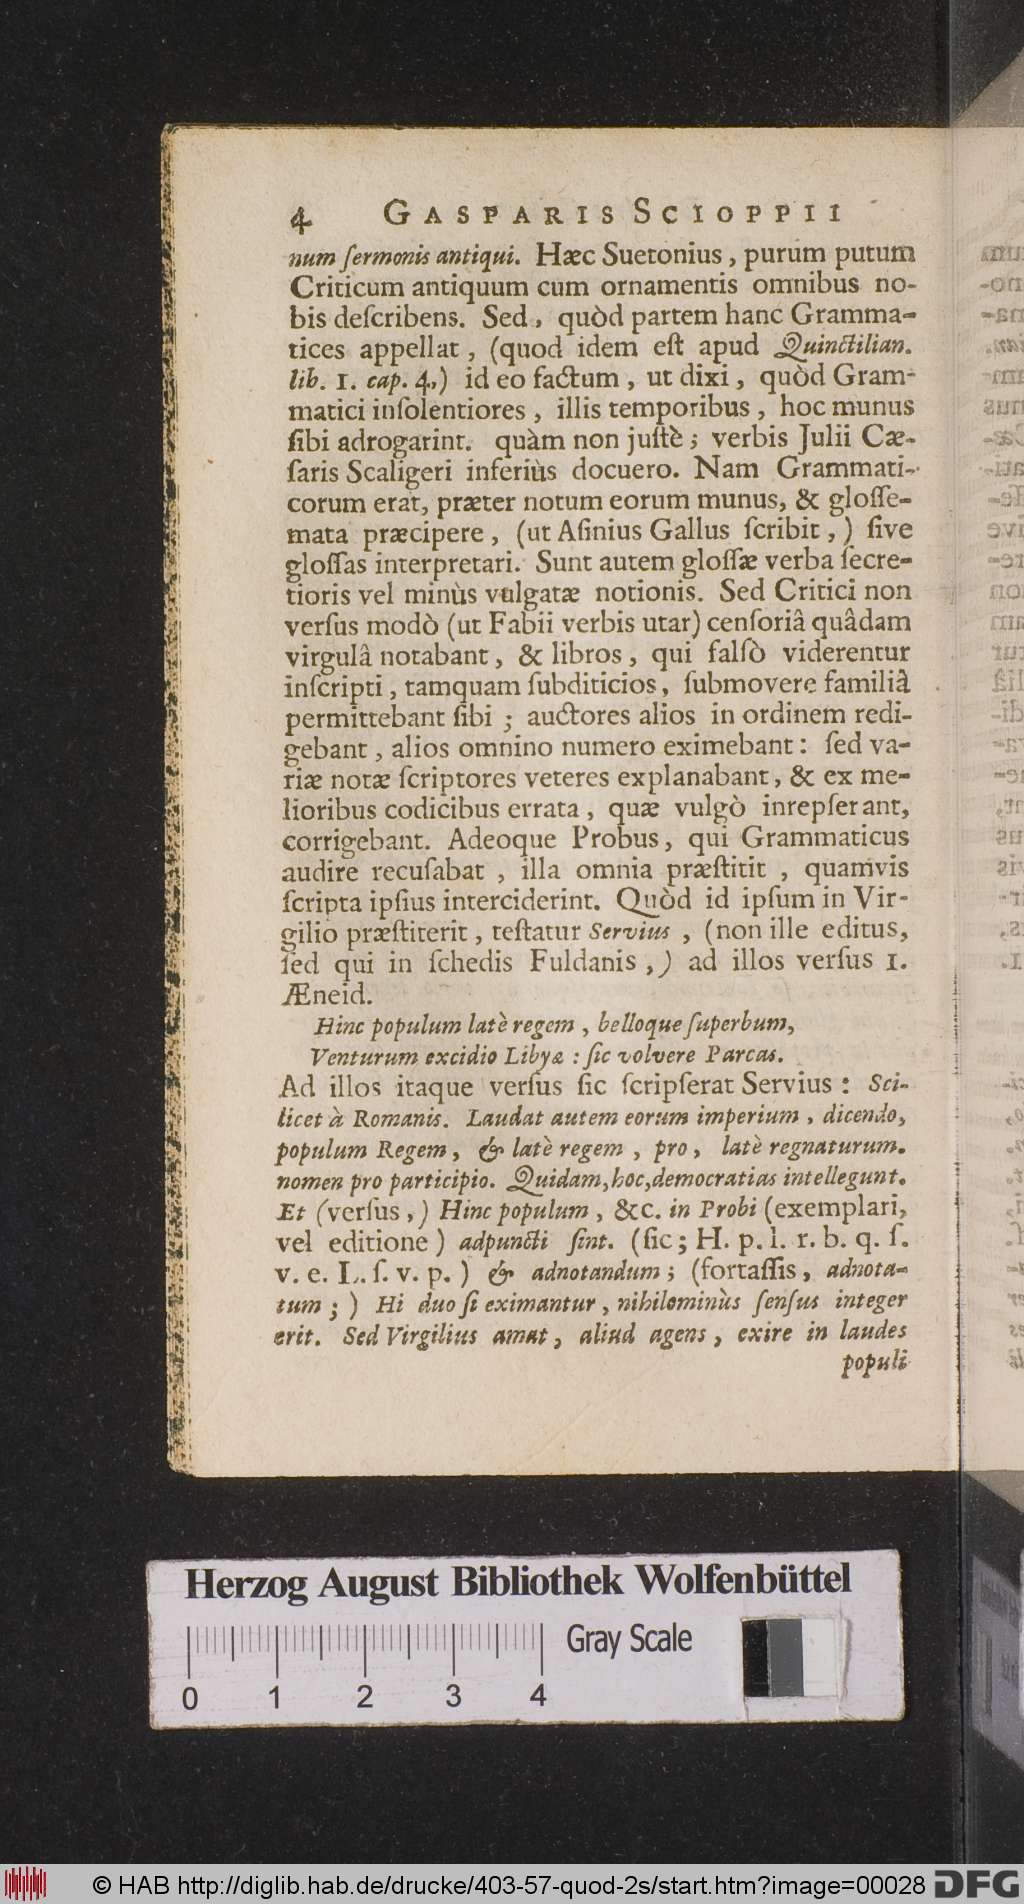 http://diglib.hab.de/drucke/403-57-quod-2s/00028.jpg